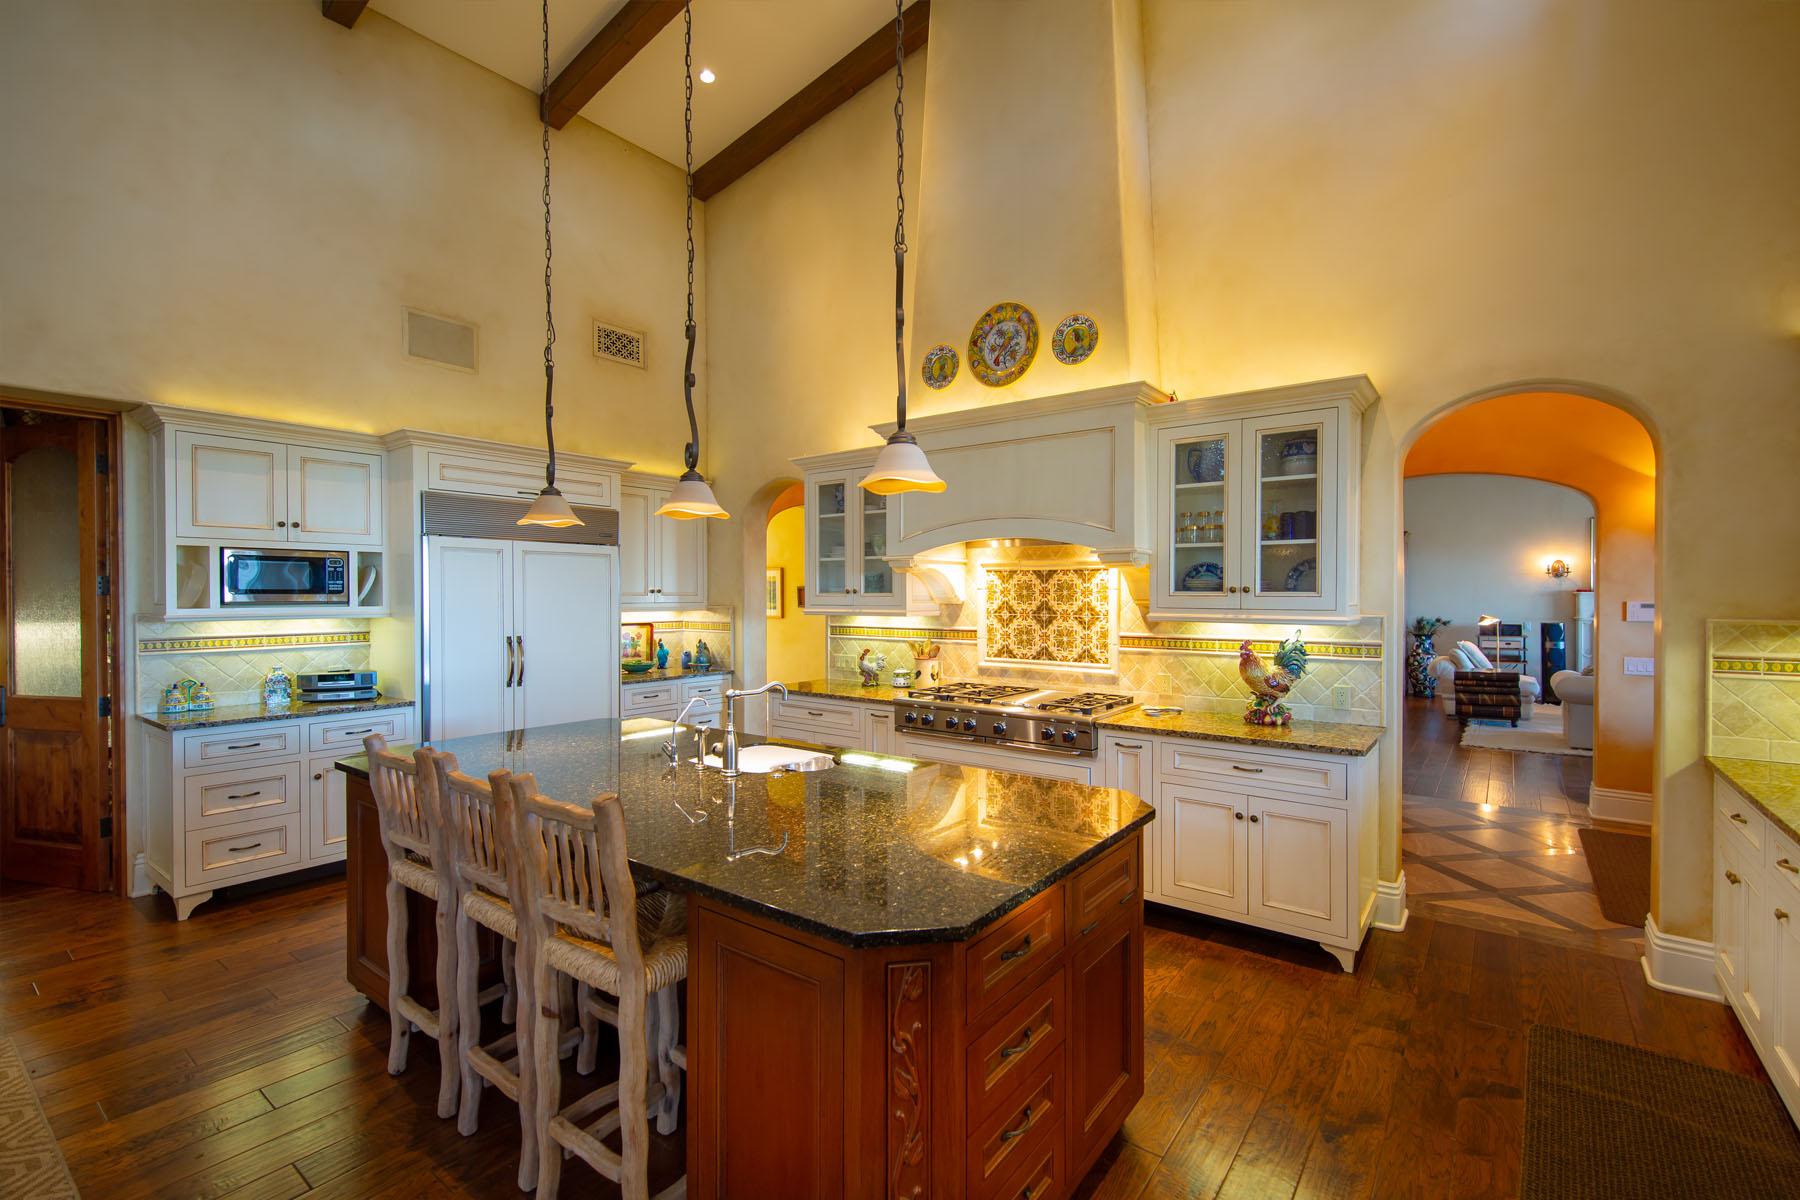 El Rancho kitchen